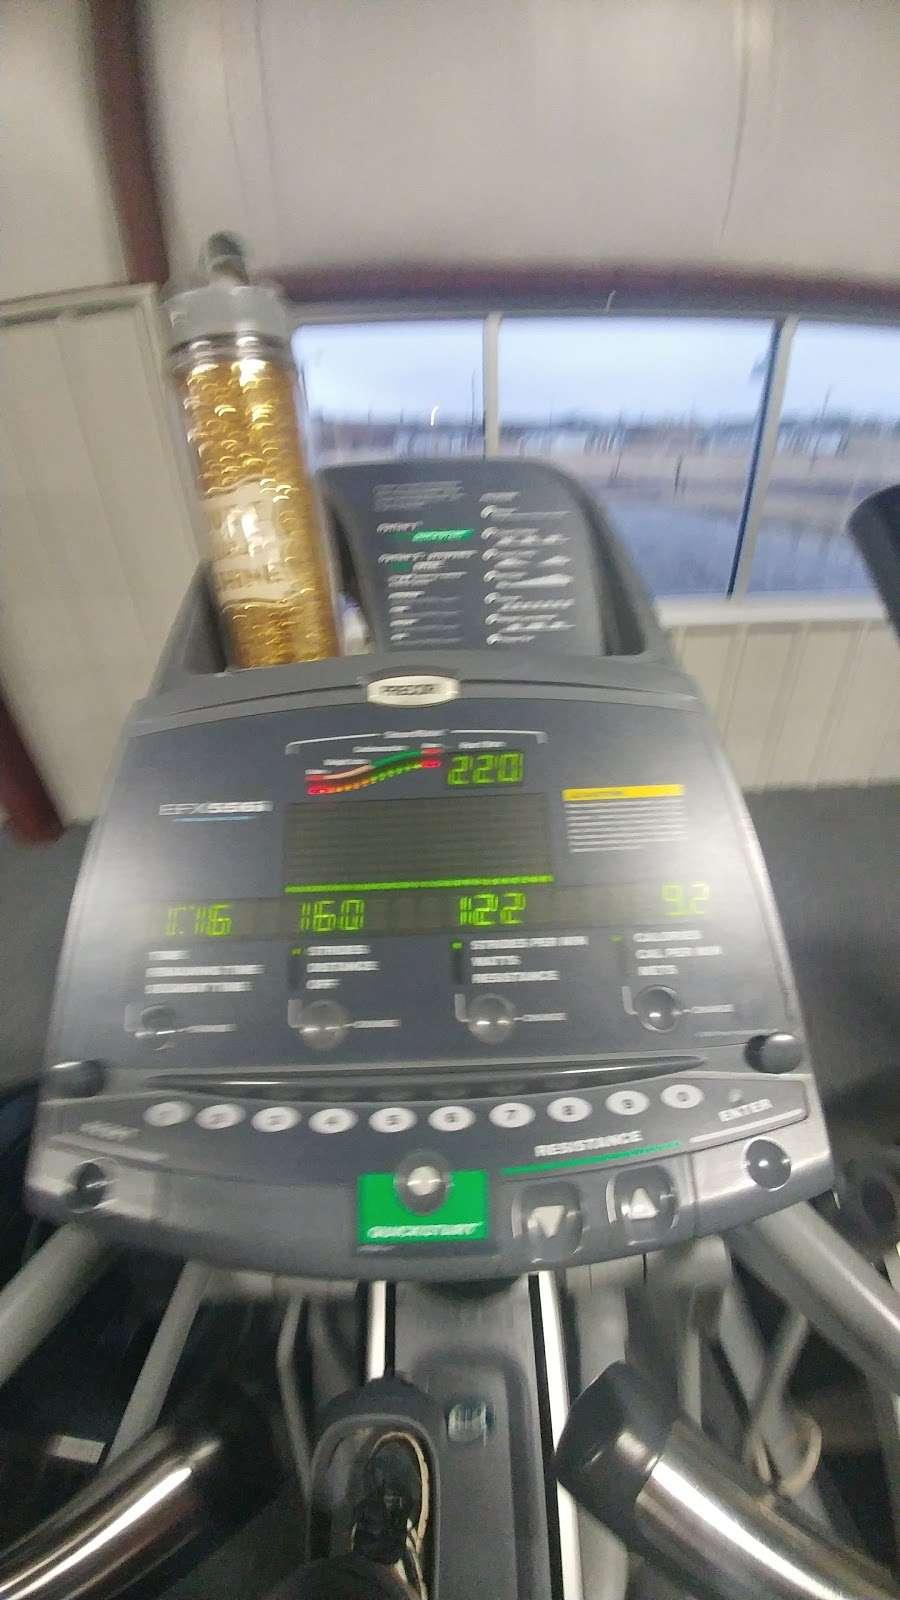 Ultimate Image Fitness Center - health  | Photo 6 of 7 | Address: 300 Spring Cir, Odessa, MO 64076, USA | Phone: (816) 633-8348